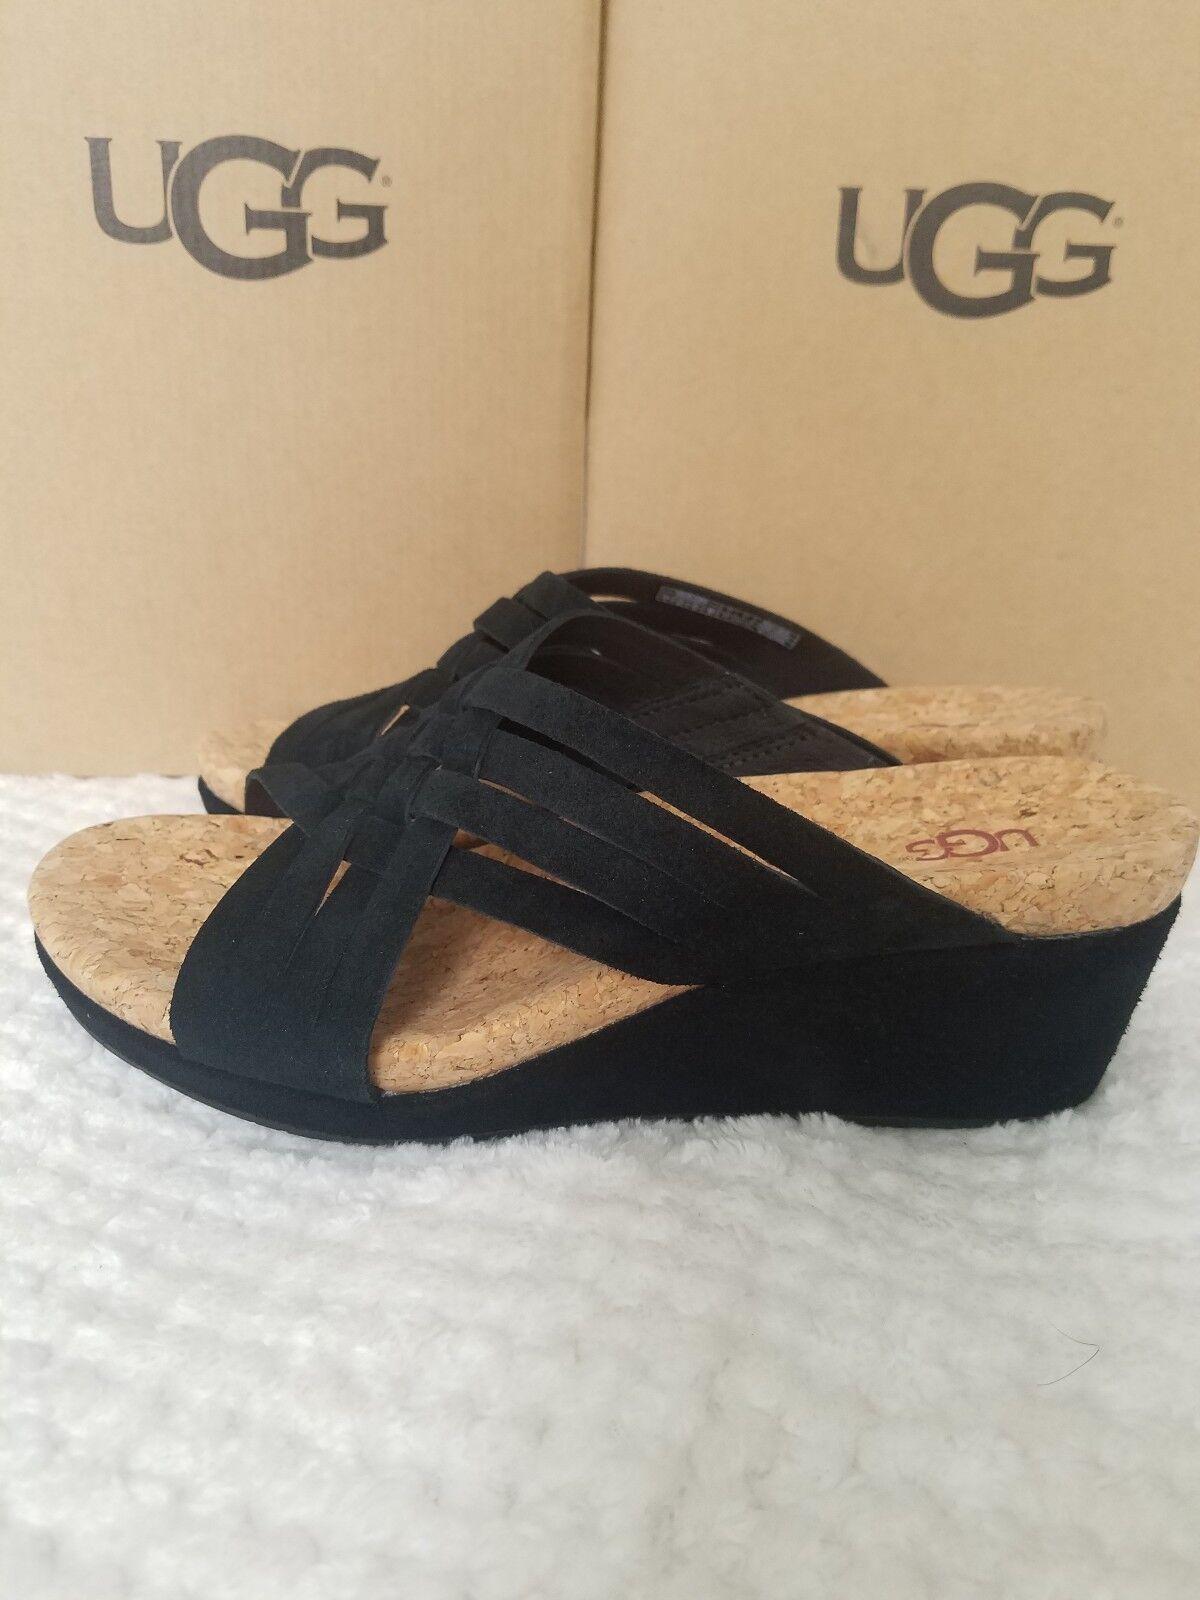 purpleh Suede Platform Wedge Sandals black Size 9